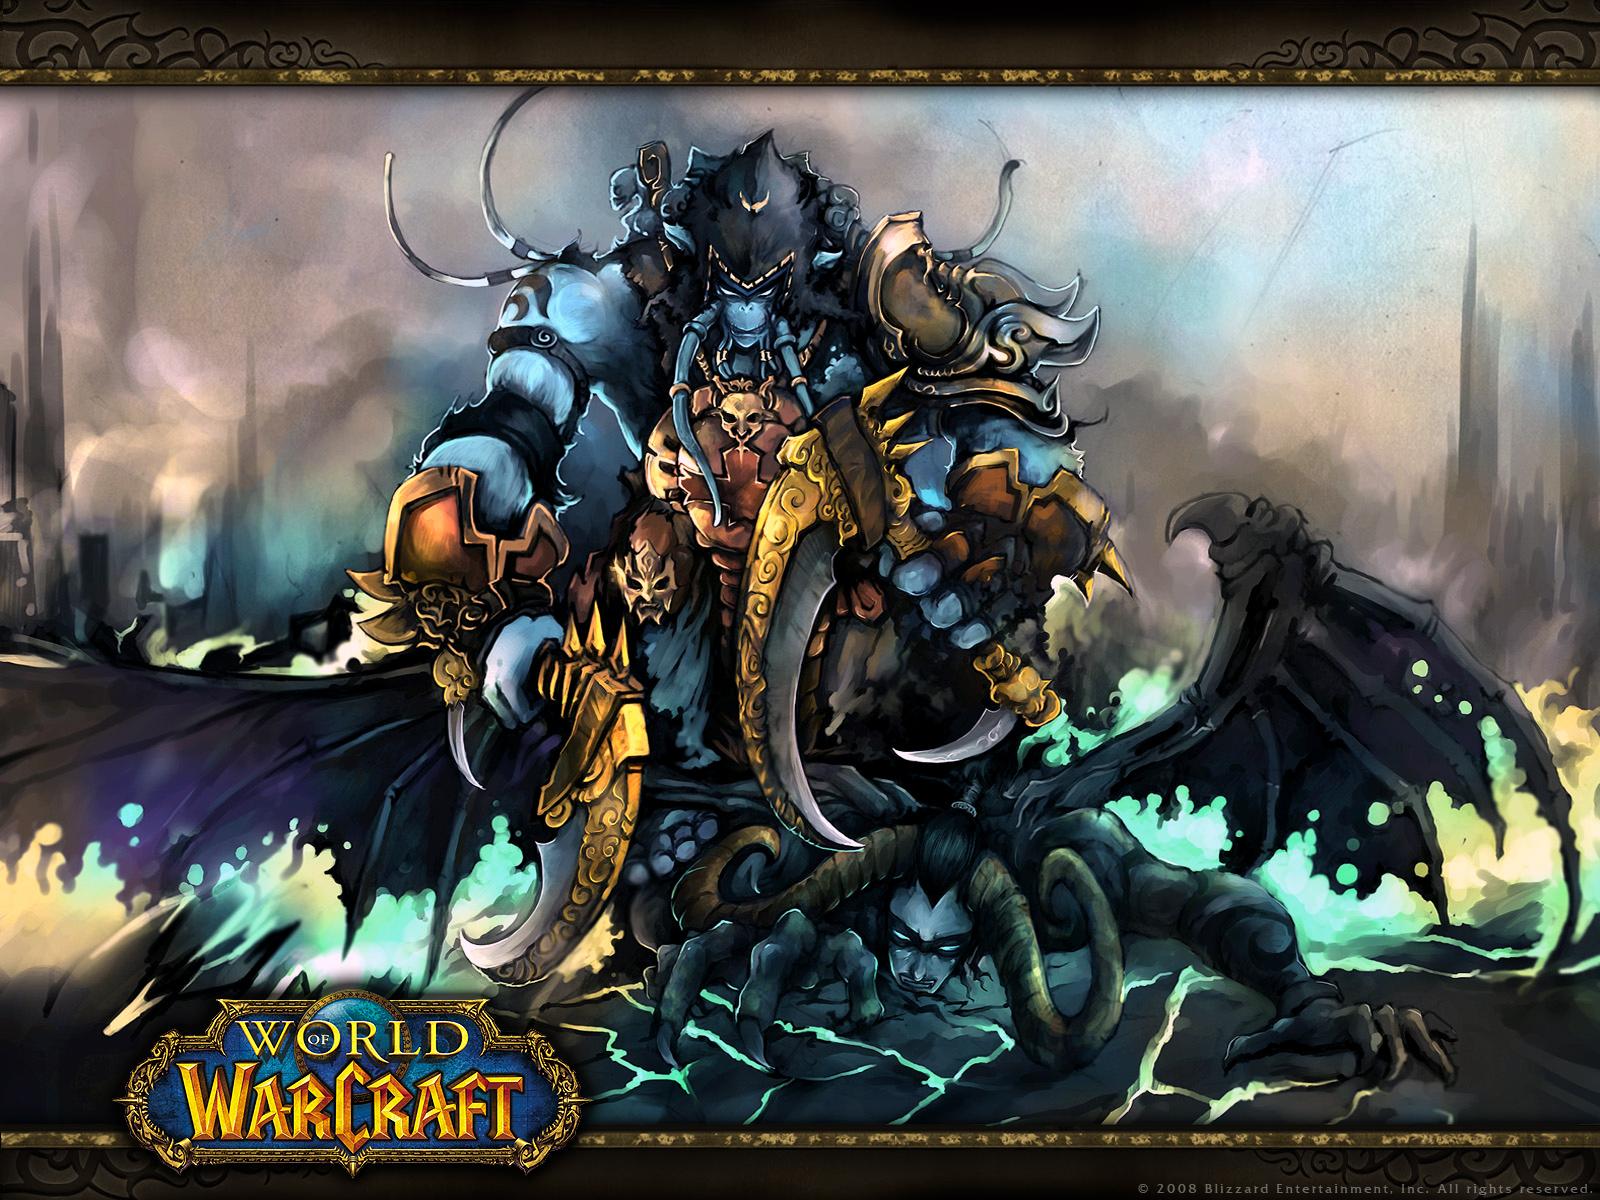 World of Warcraft wallpaper 26